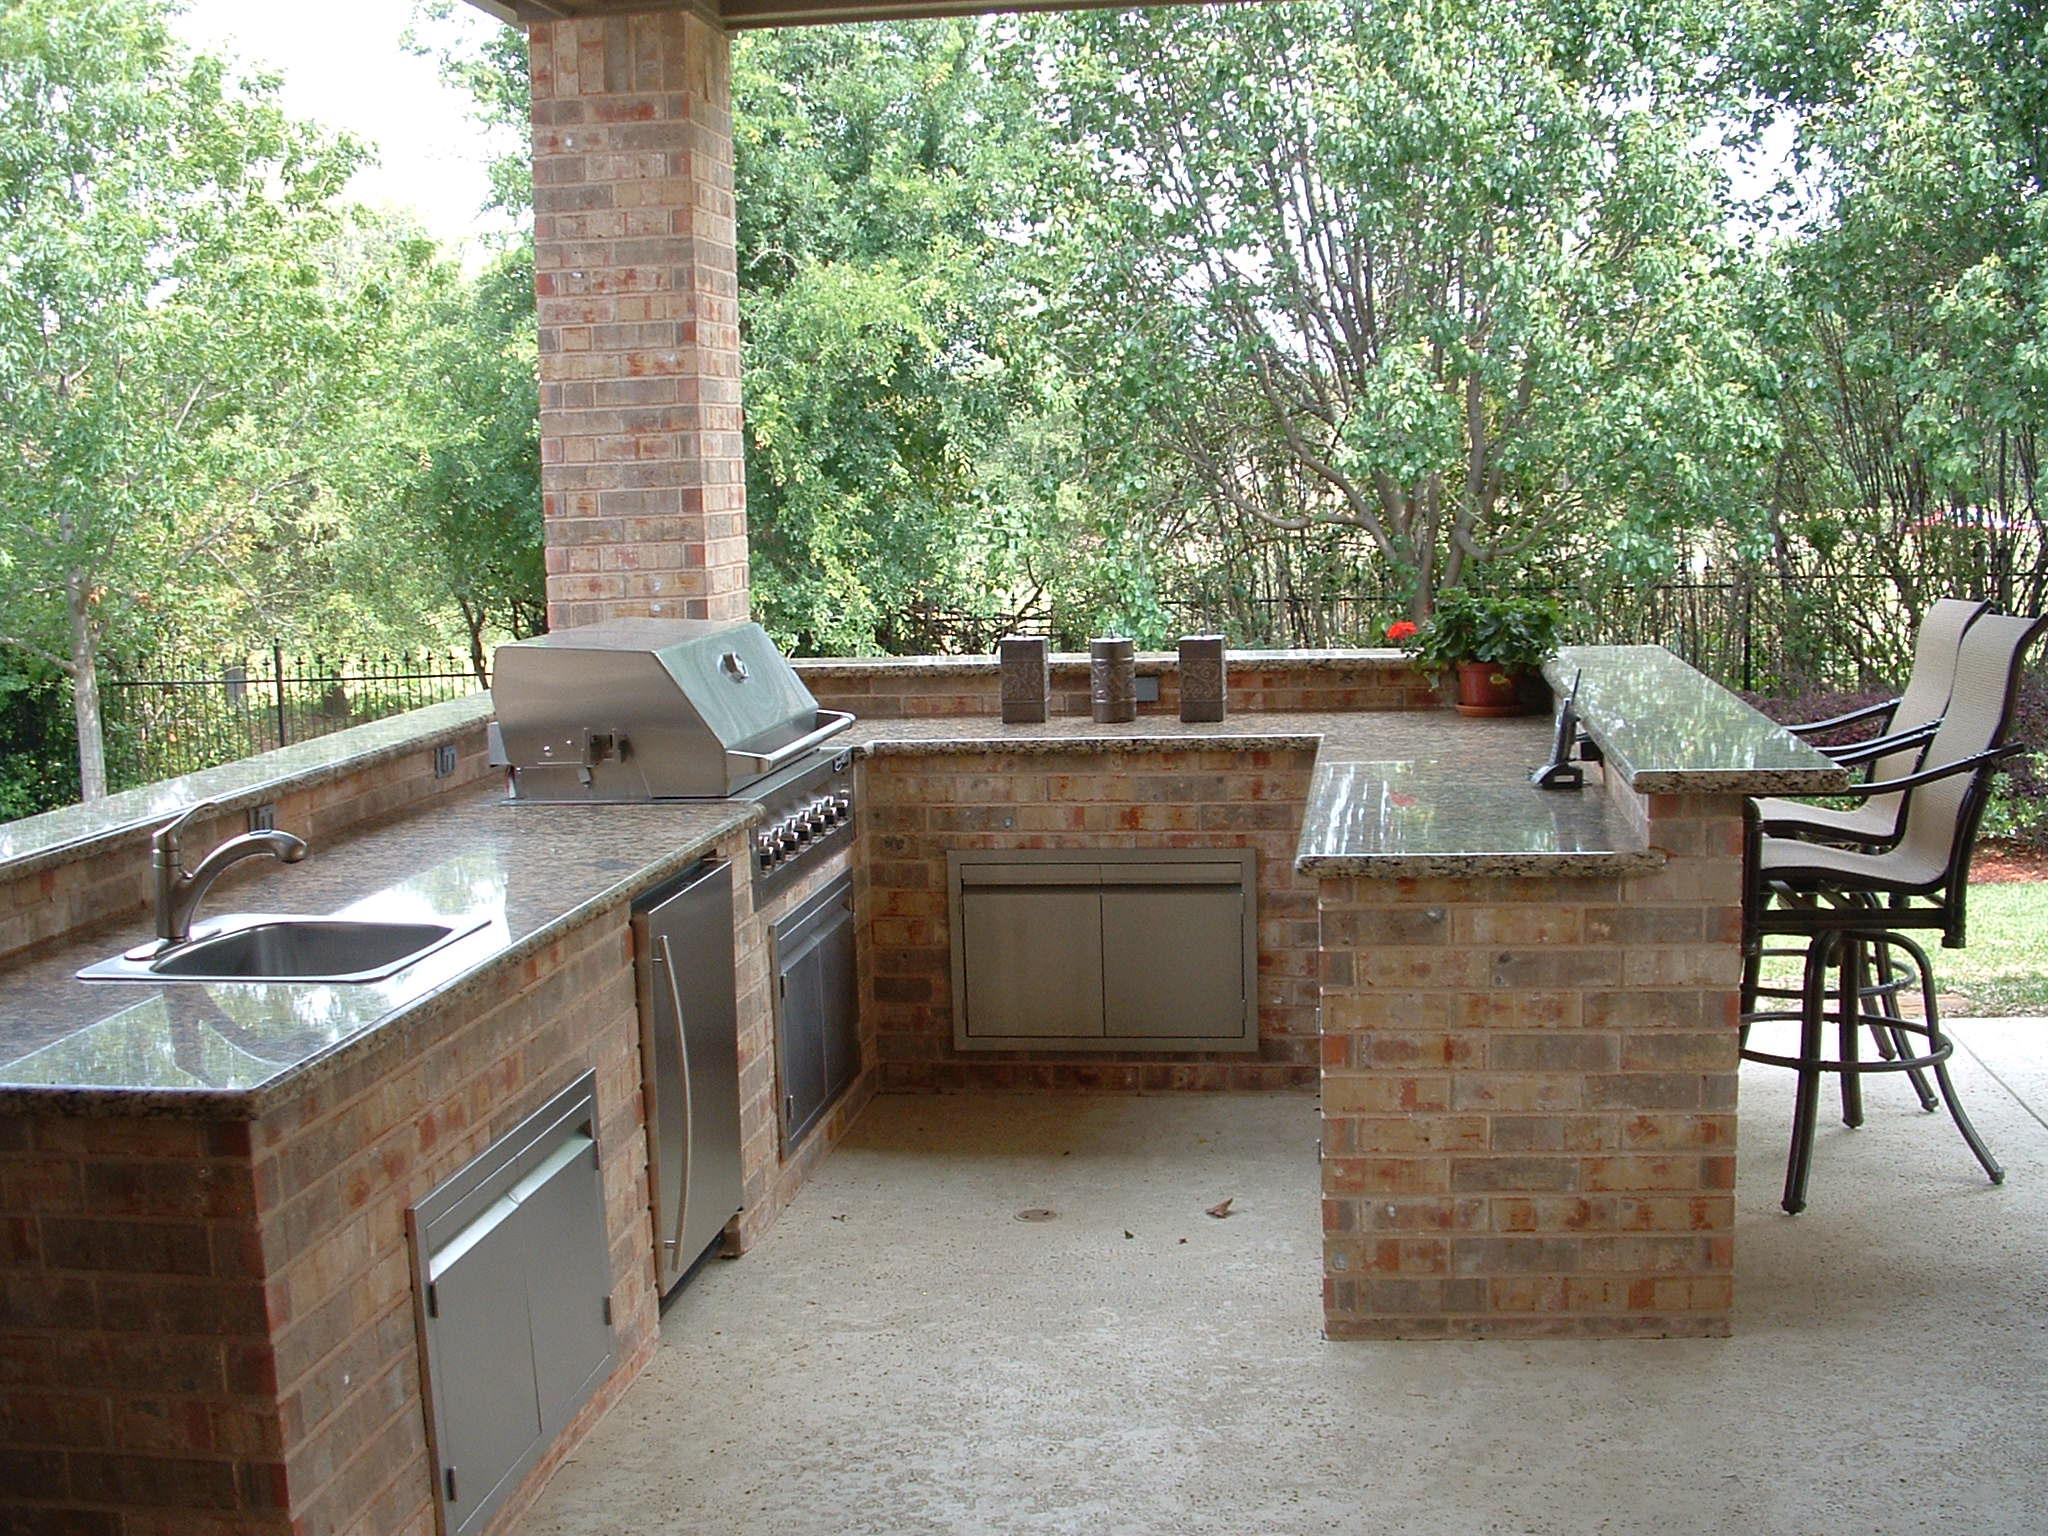 Denver Outdoor Kitchens Equipment  Installations